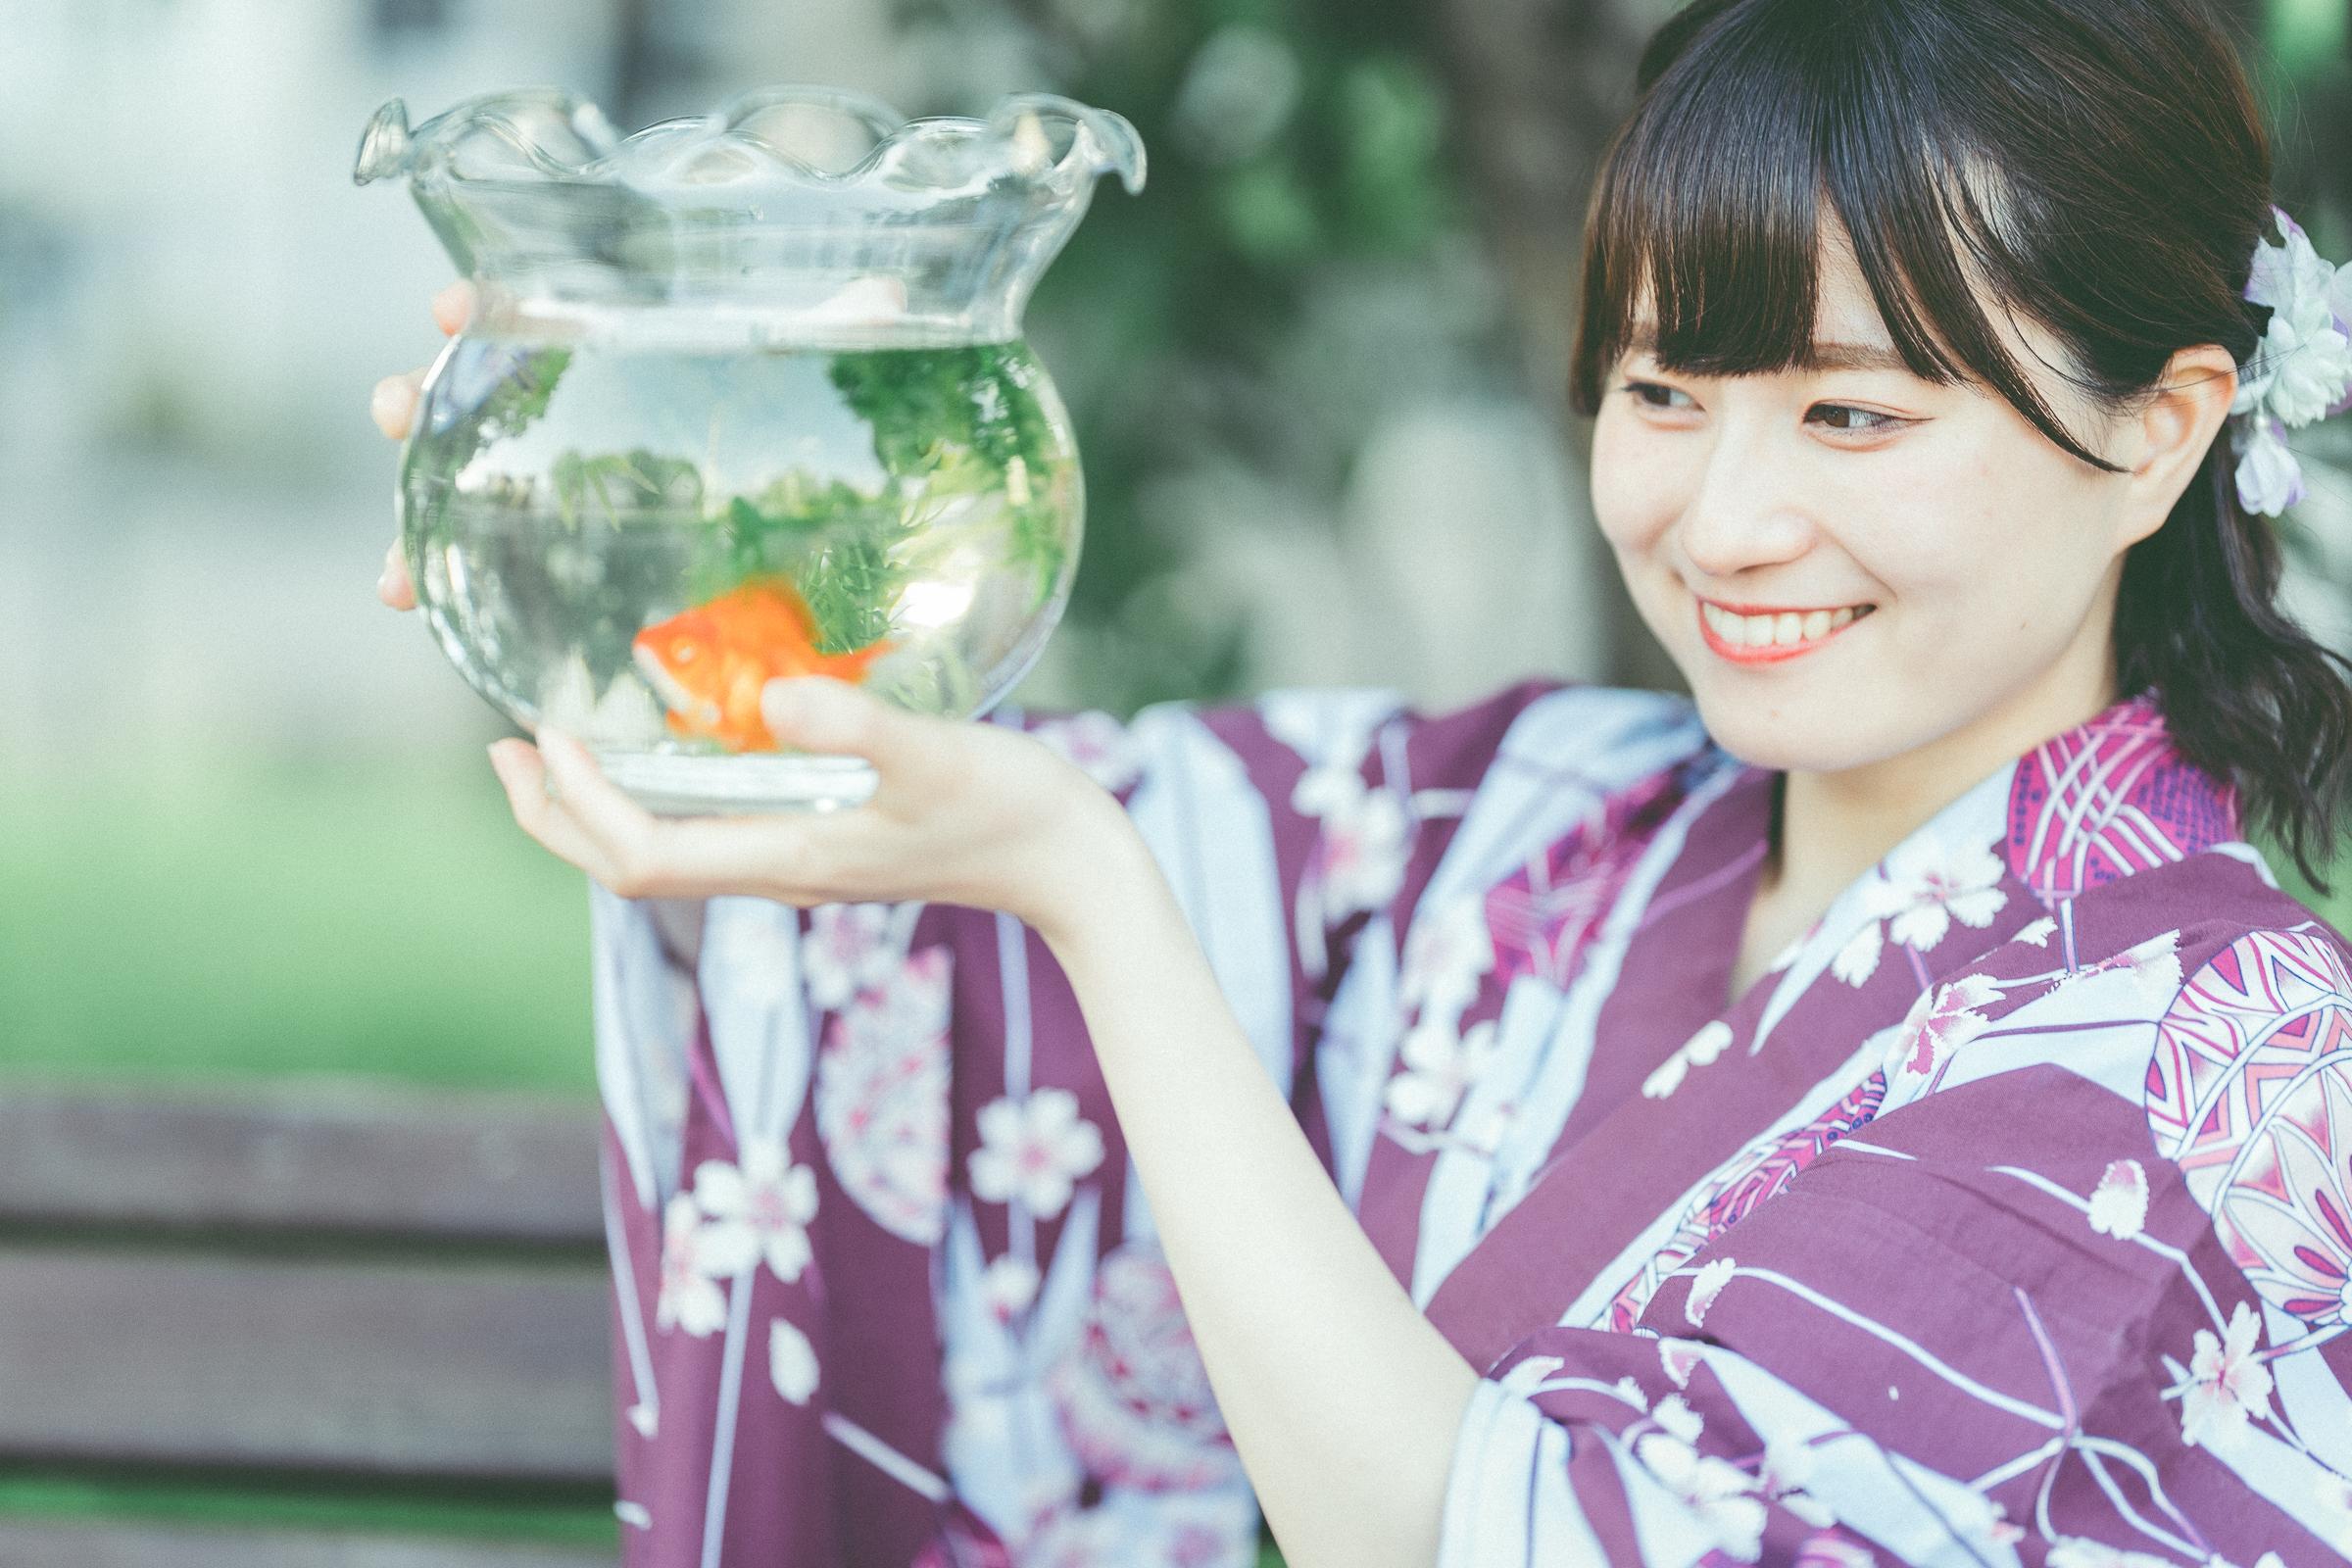 HAPPY少女♪ あゆみ ( 新谷亜由美 ) | SMP 札幌モデルプロ 浴衣撮影会